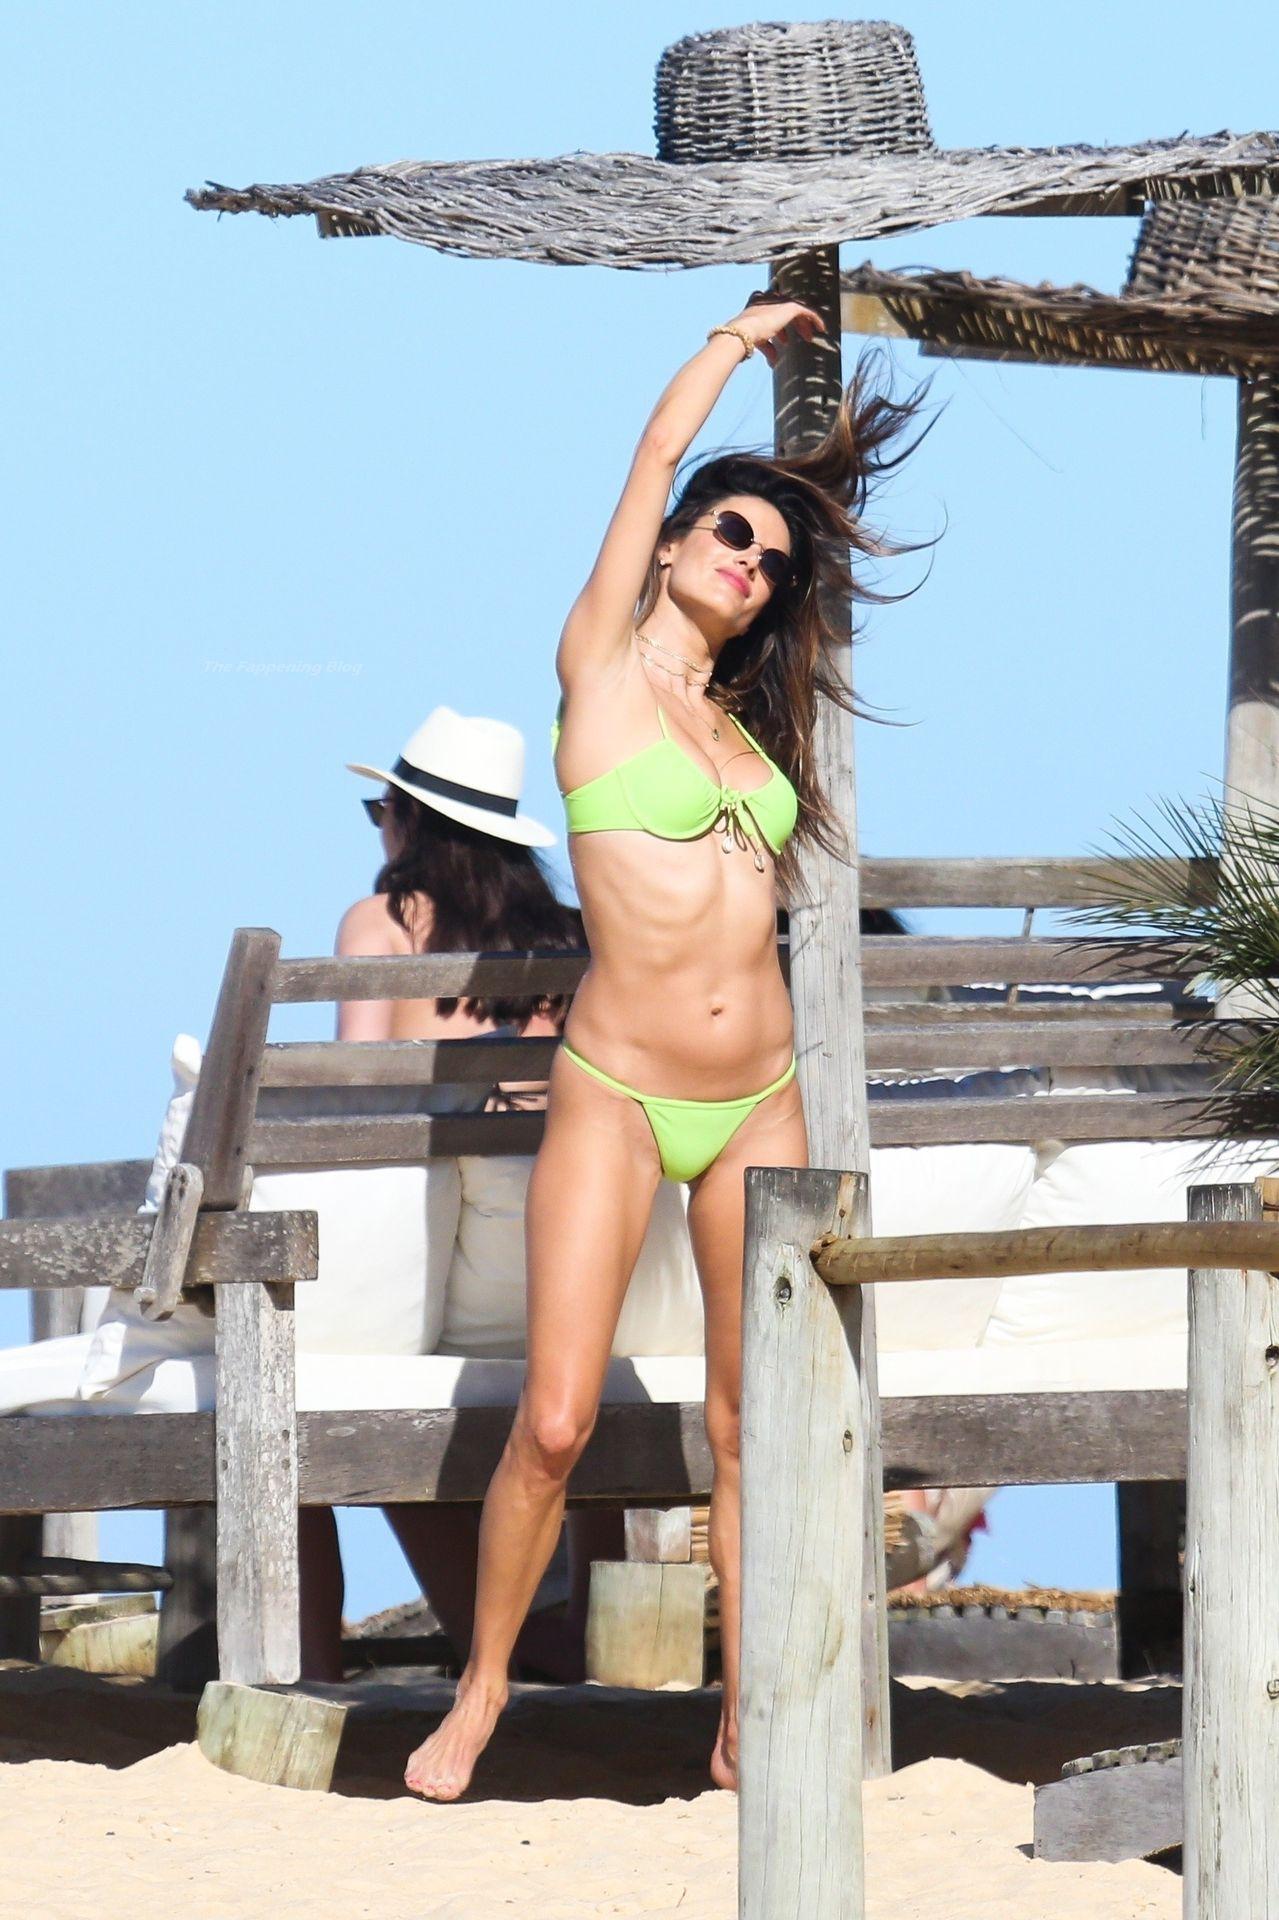 Alessandra-Ambrosio-Sexy-The-Fappening-Blog-891.jpg